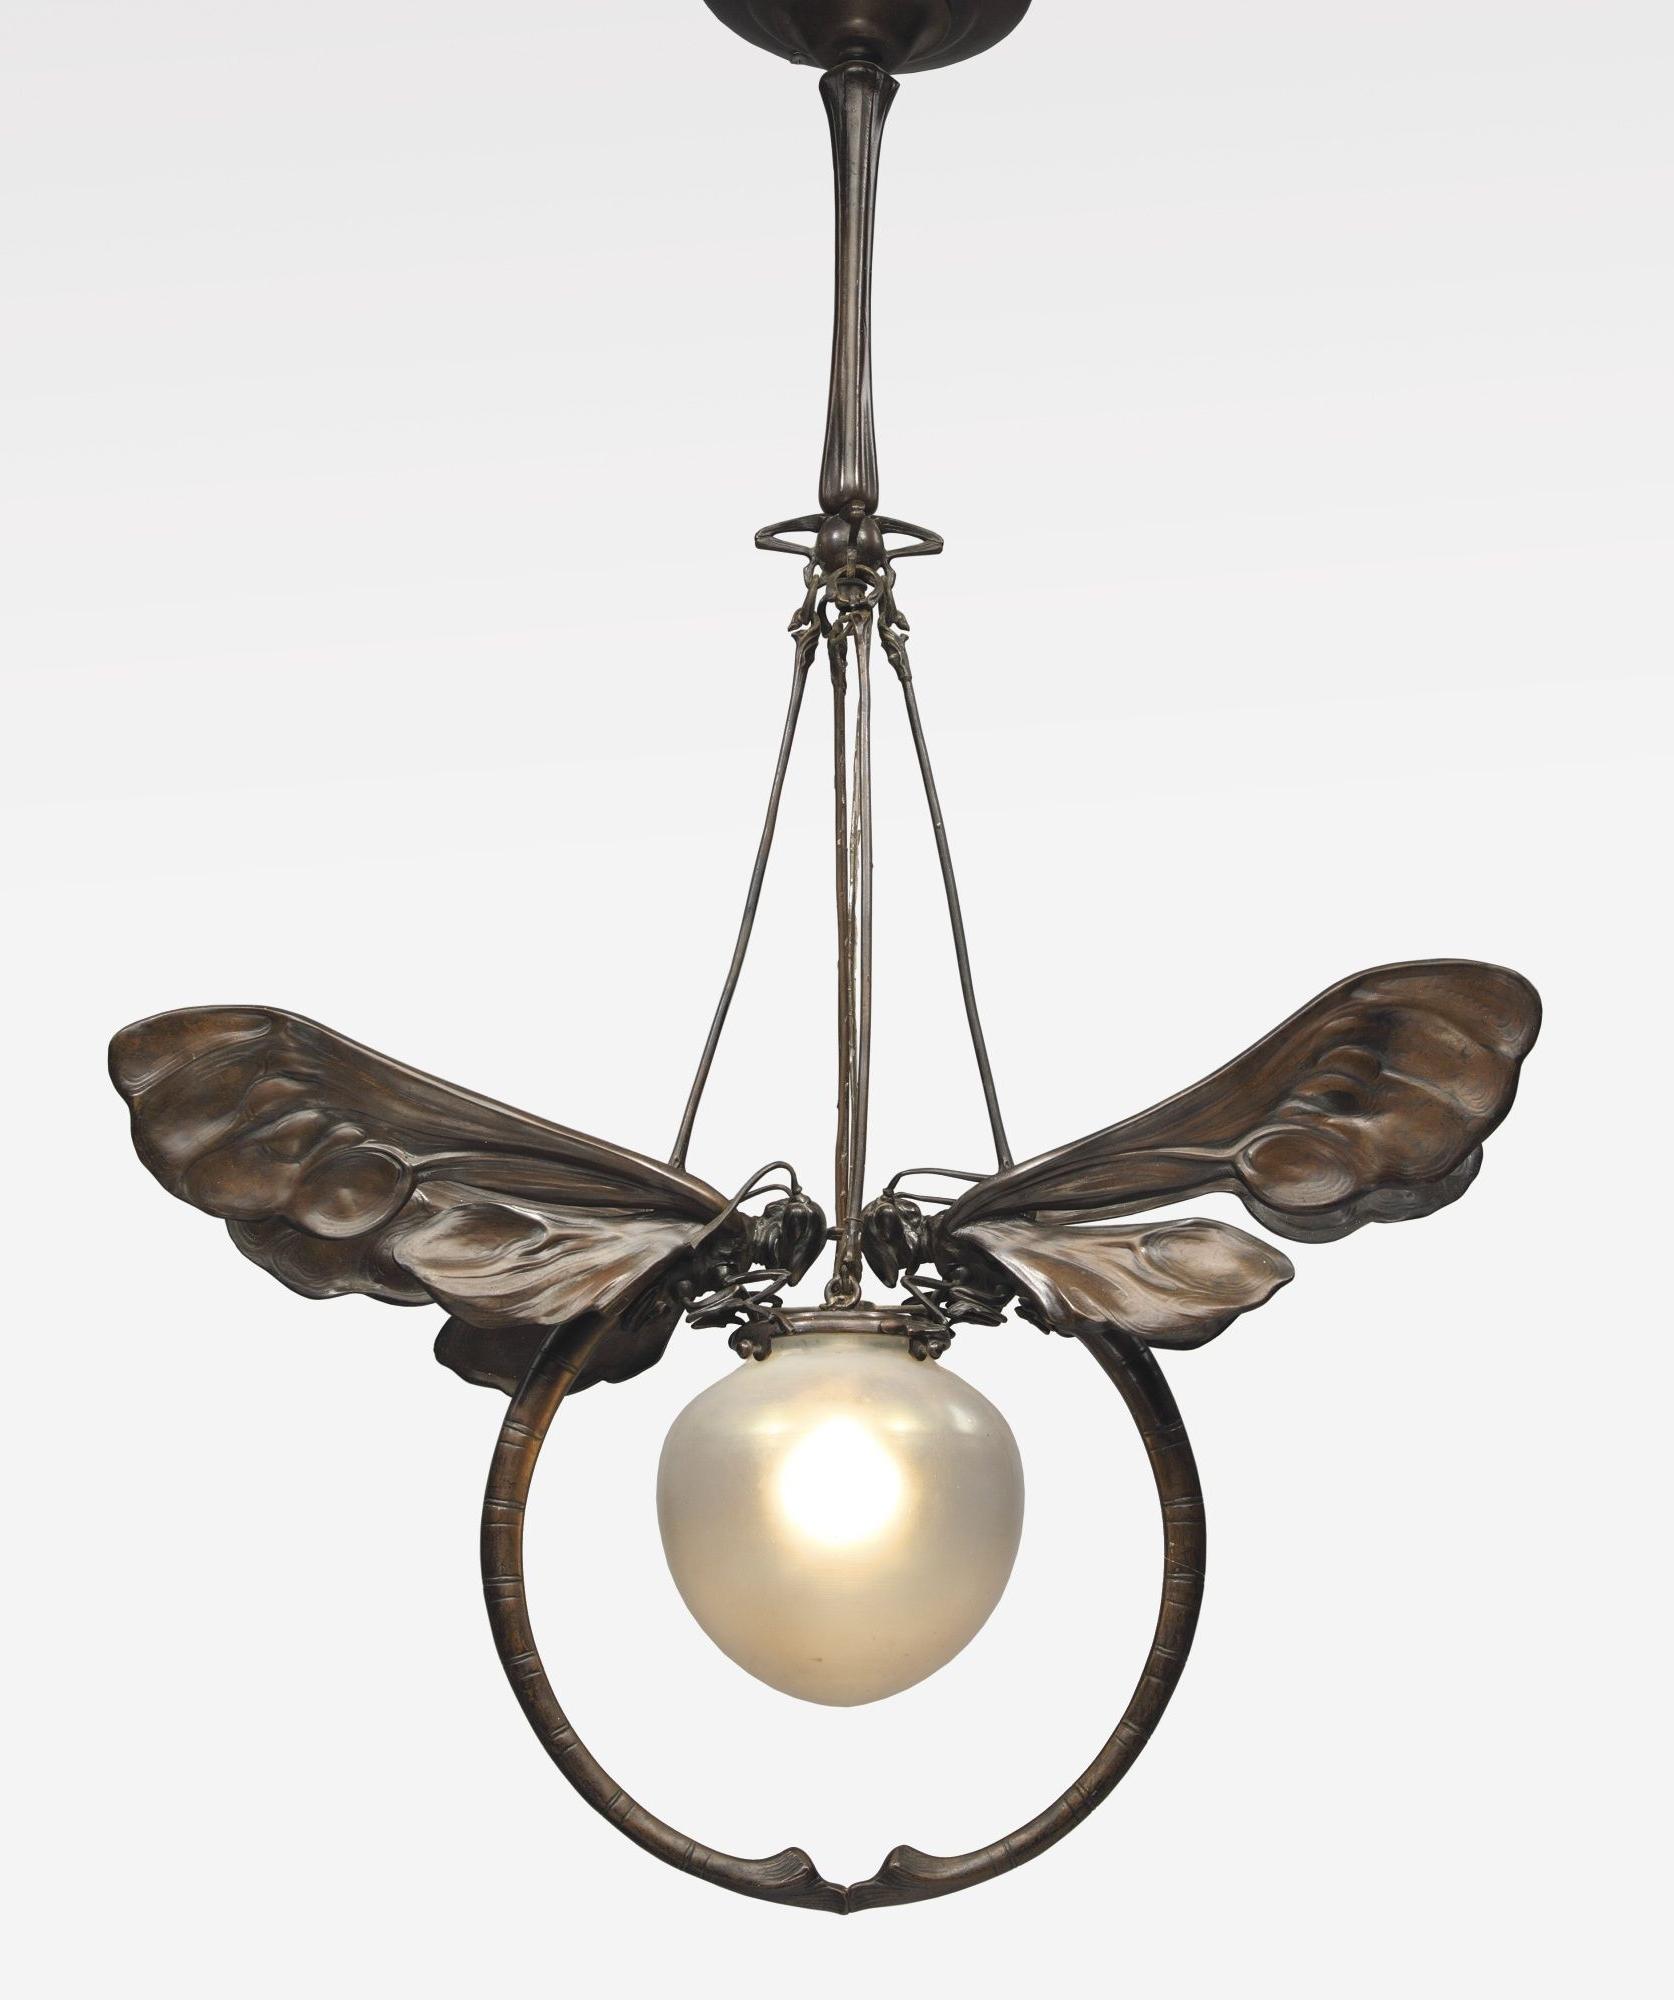 Art Deco Chandelier Regarding Fashionable European Art Nouveau Chandelier Patinated Bronze And Glass (View 14 of 20)